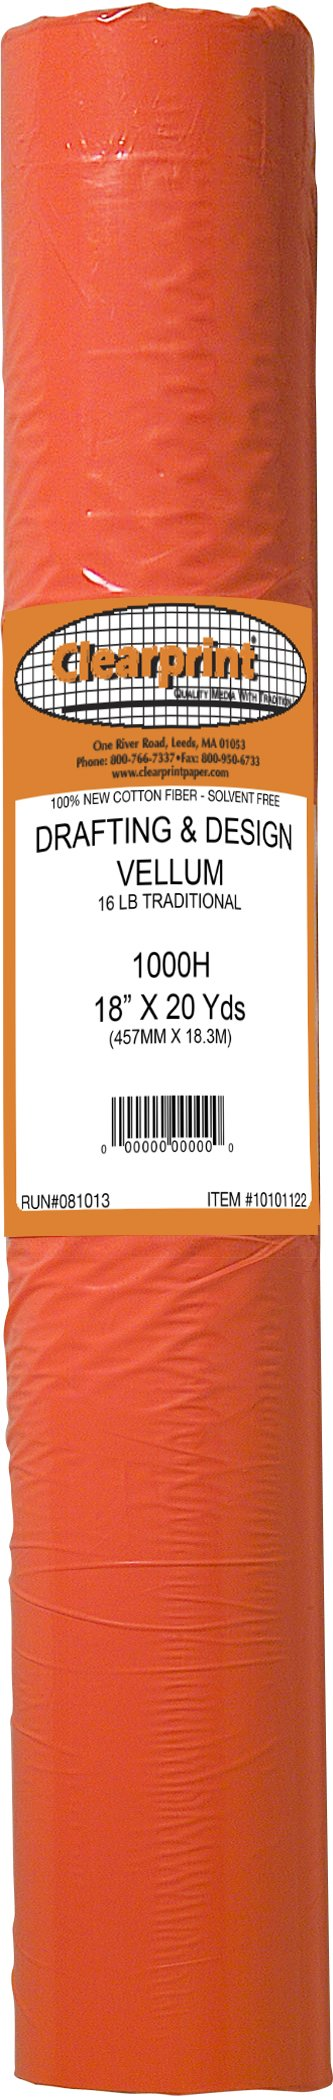 Clearprint 1000H Design Vellum Roll, 16 lb, 100% Cotton, 18 Inches W x 20 Yards Long, Translucent White, 1 Each (10101122)